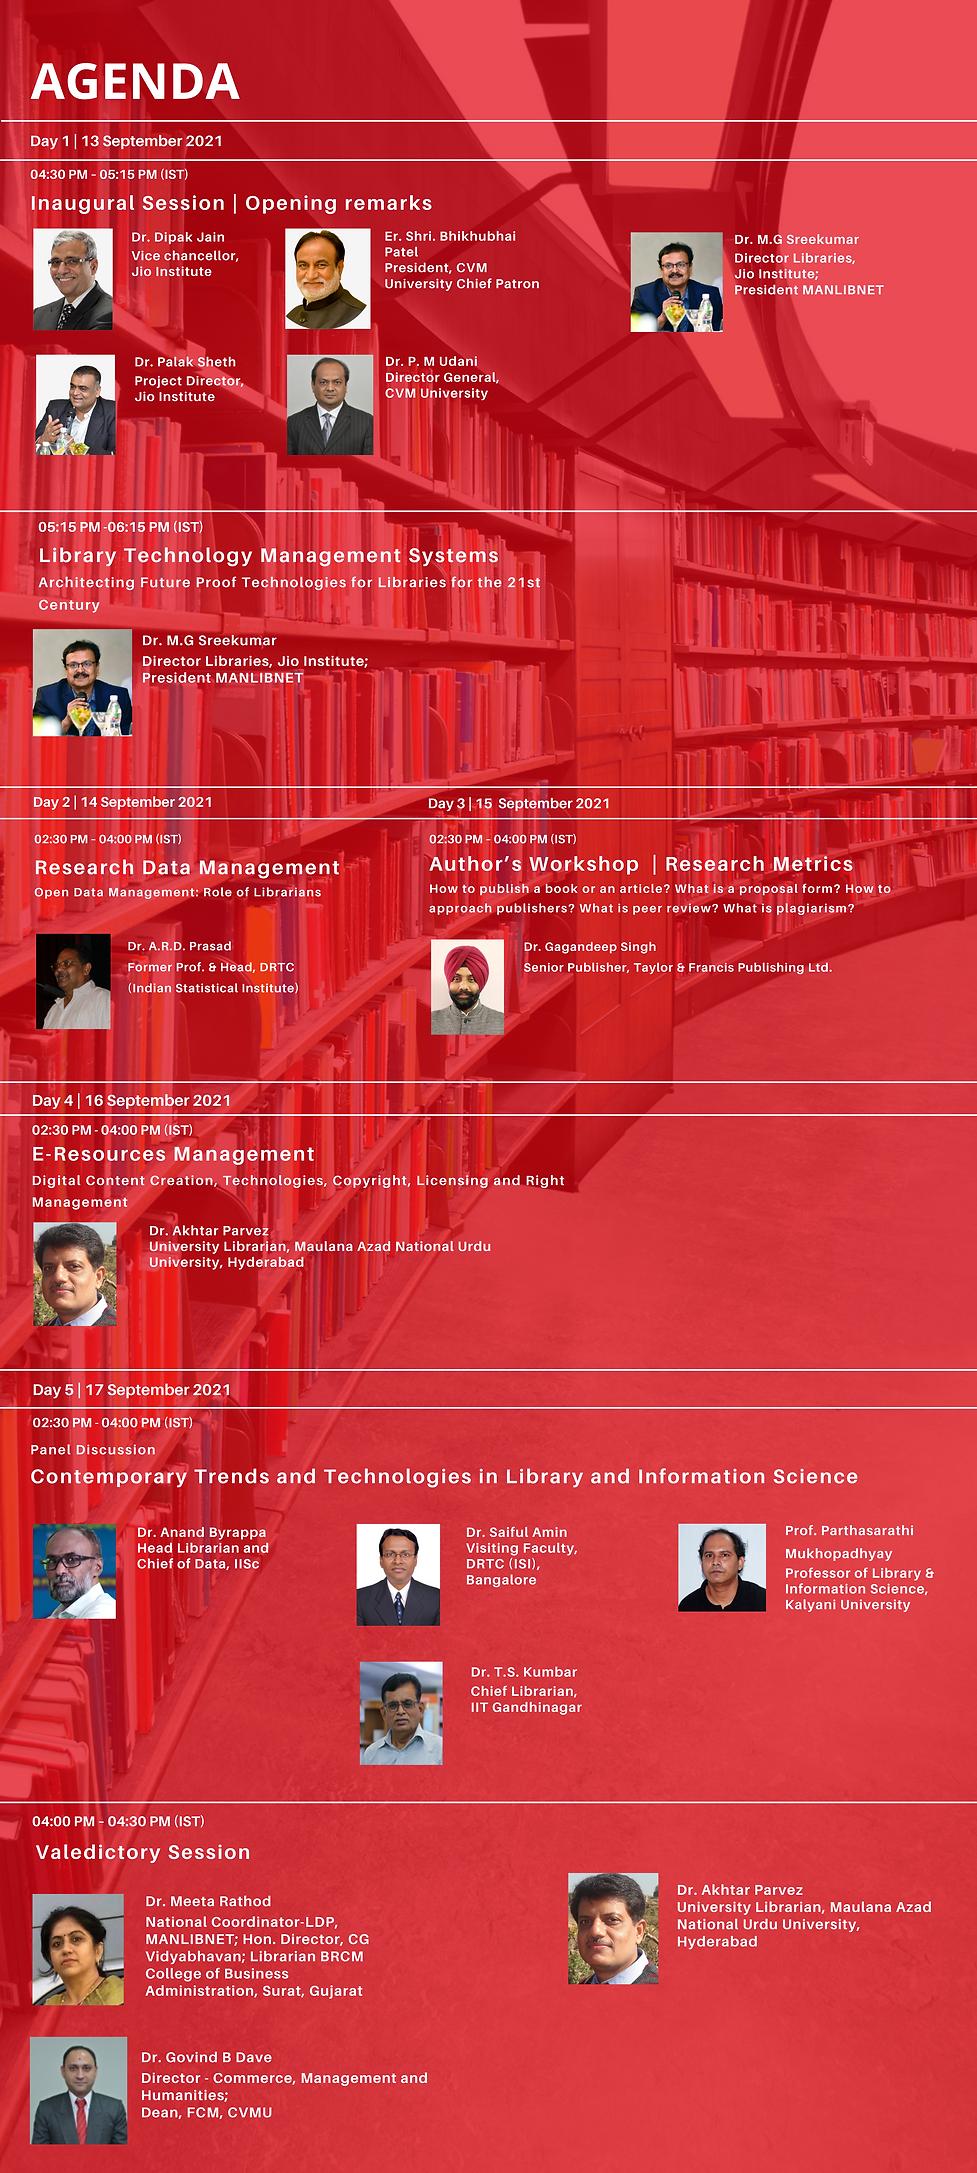 Copy of Dr. Dipak Jain Vice chancellor, Jio Institute (2).png